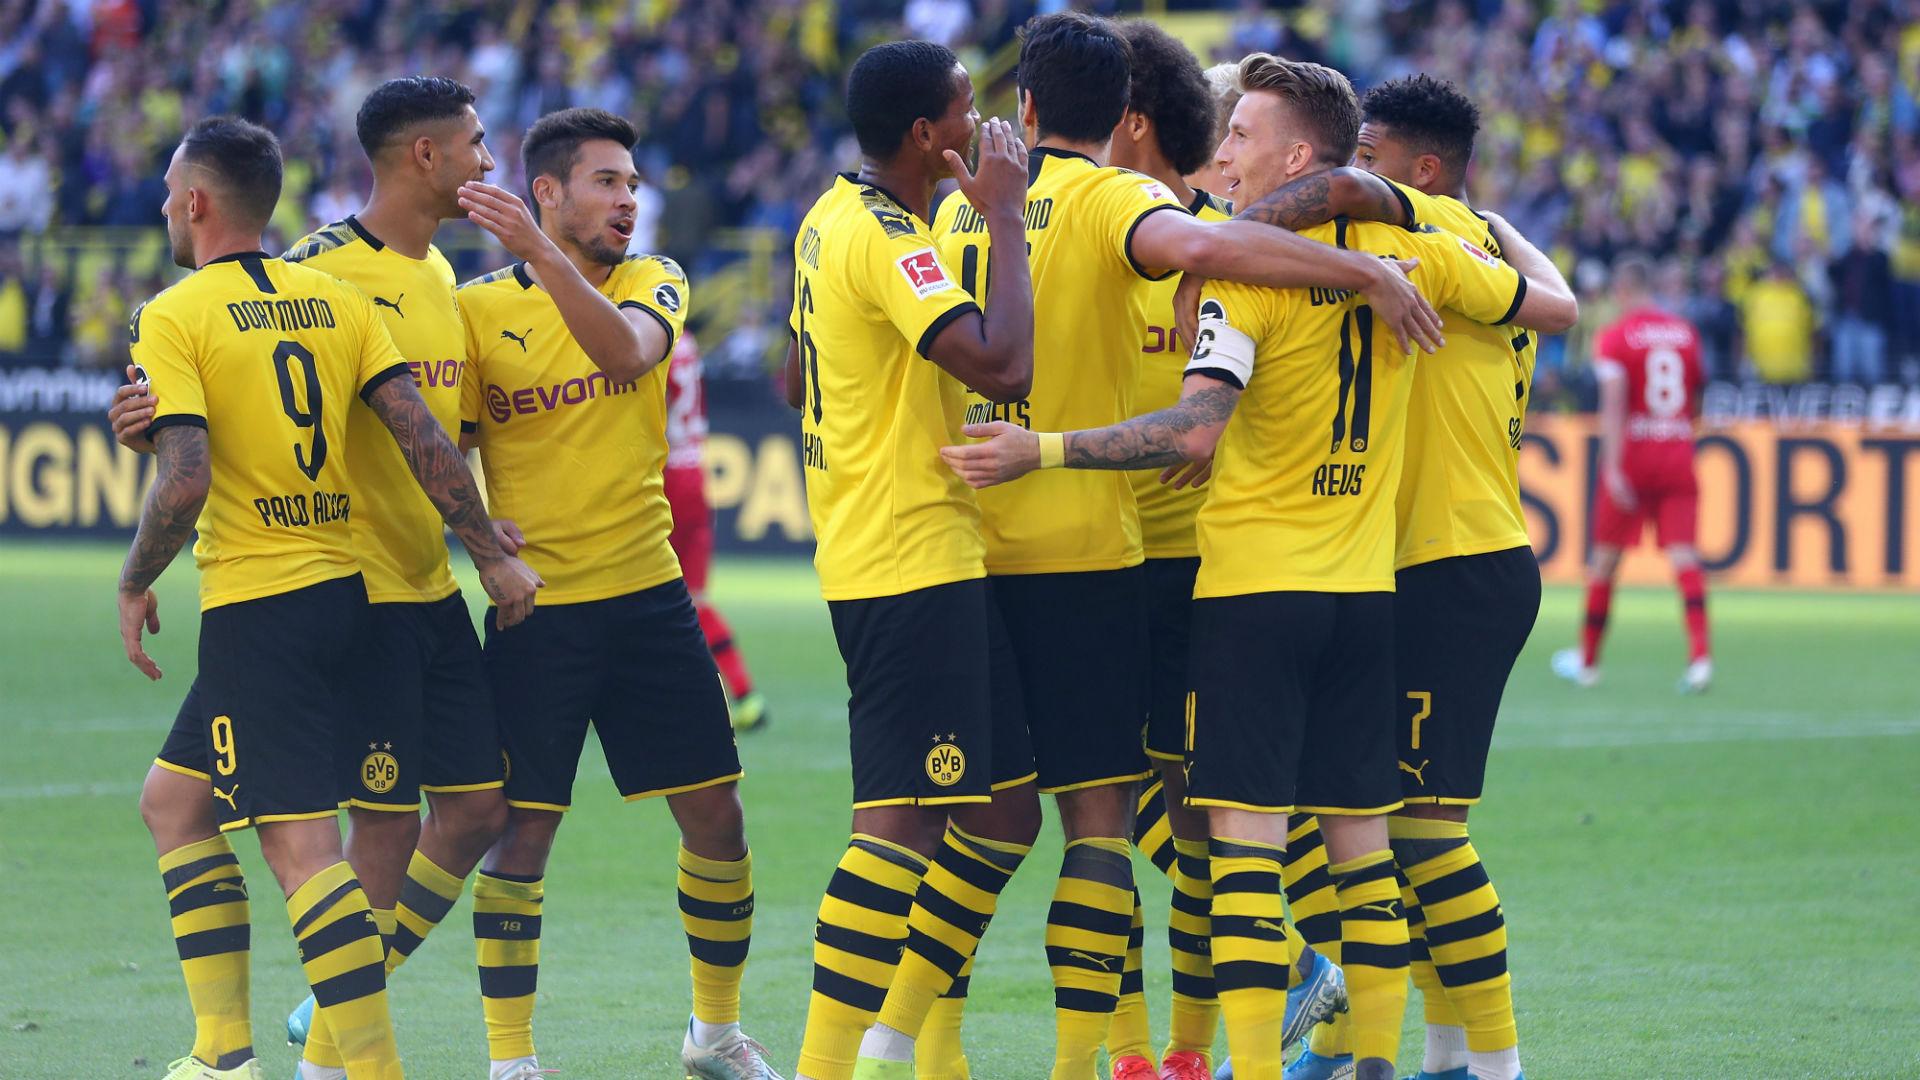 Borussia Dortmund v Bayer Leverkusen Goal Celebration 09142019